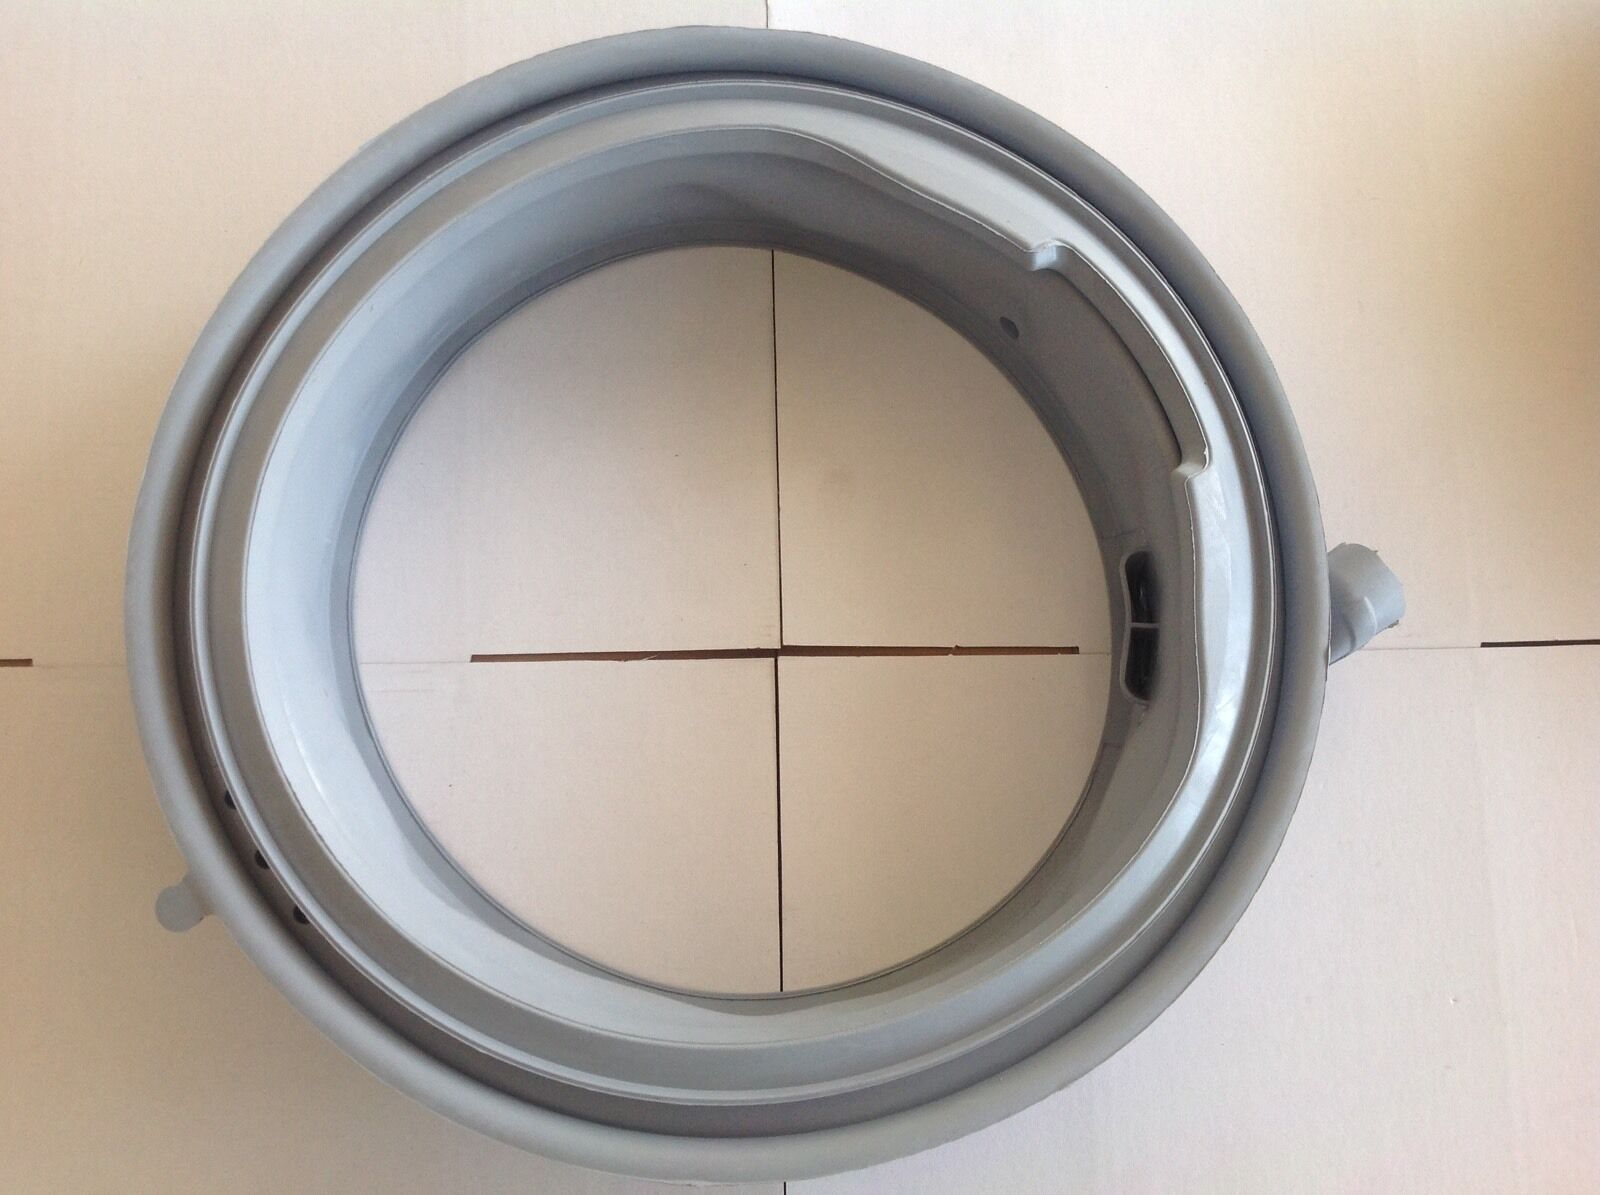 Siemens iQ800 Washing Machine Door Boot Seal Gasket WM16Y892AU/03 WM16Y892AU/09